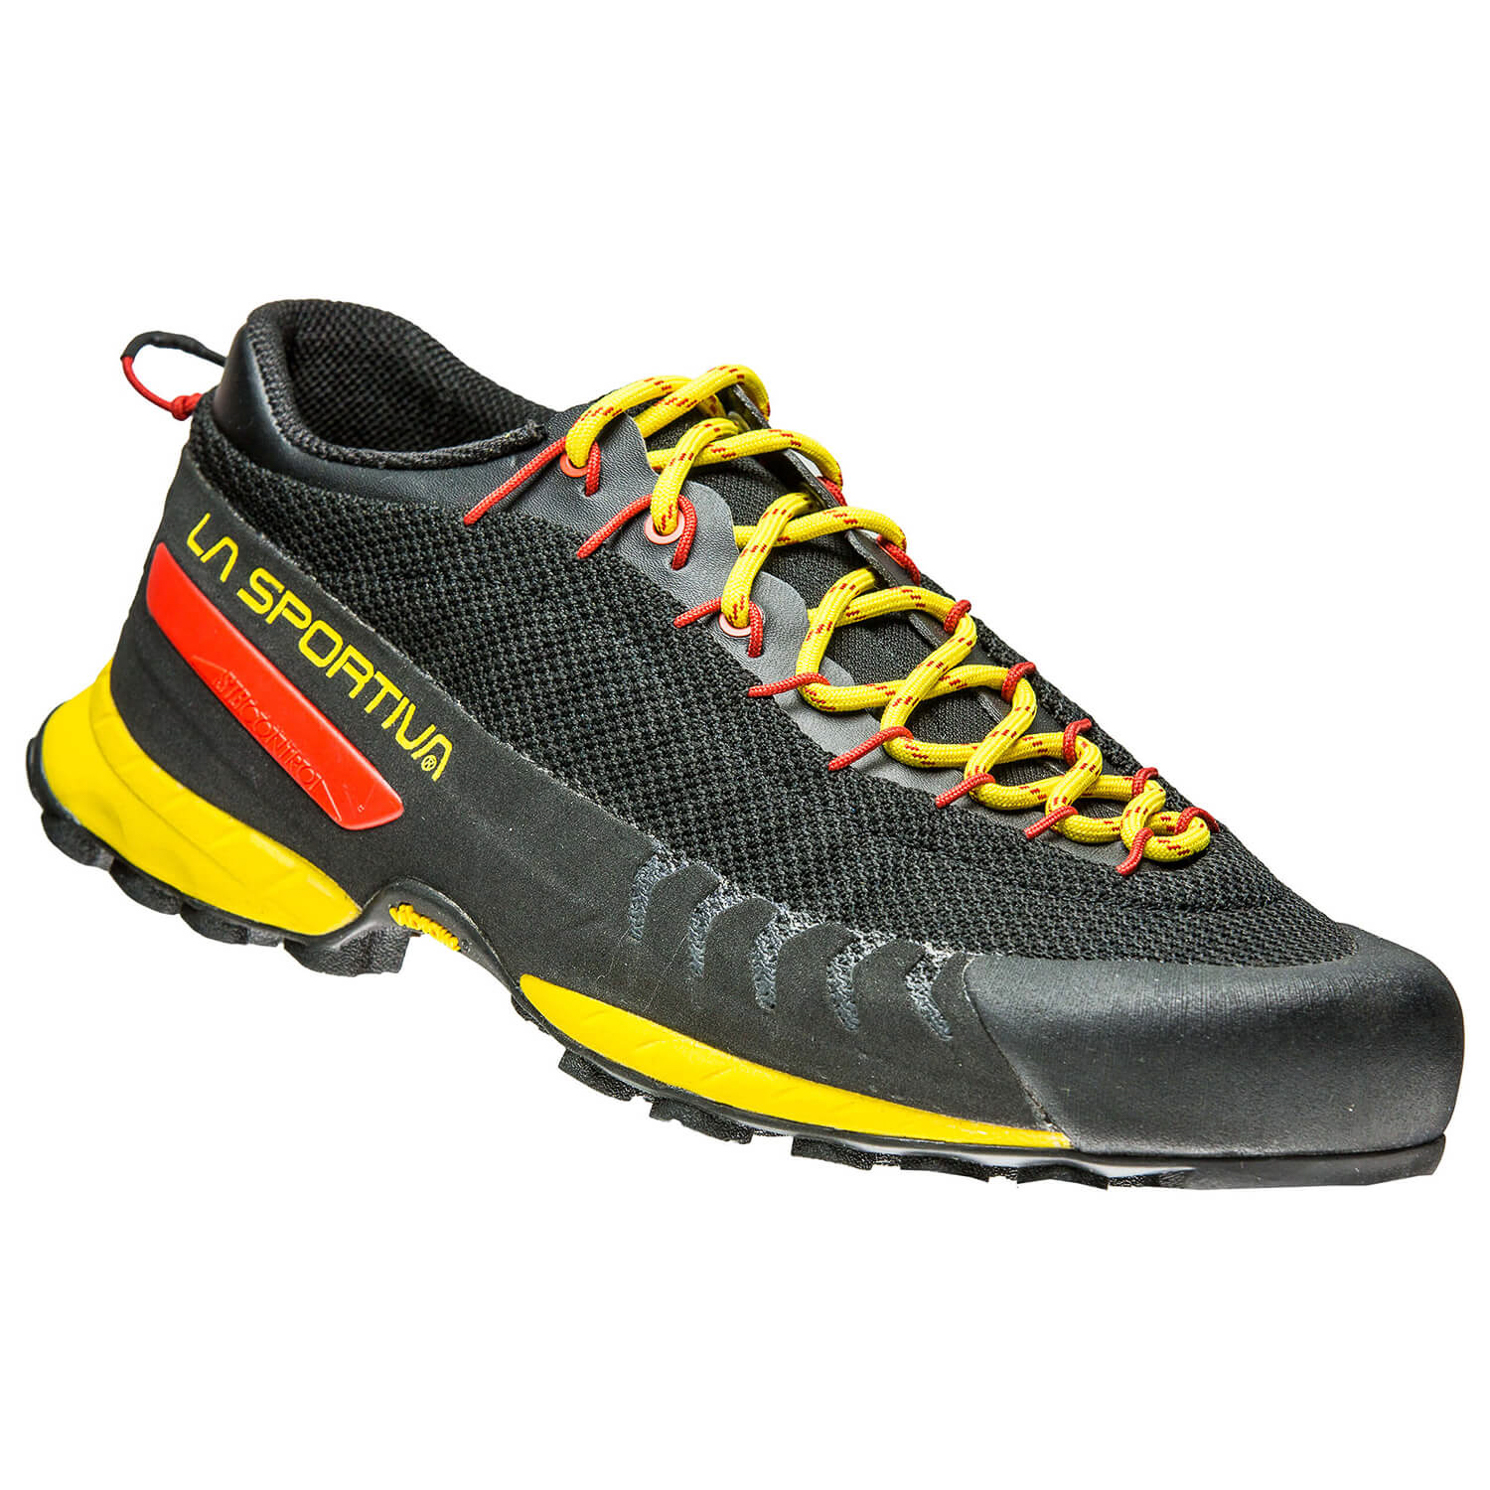 La Sportiva Tx3 Approach Shoes Men S Free Uk Delivery